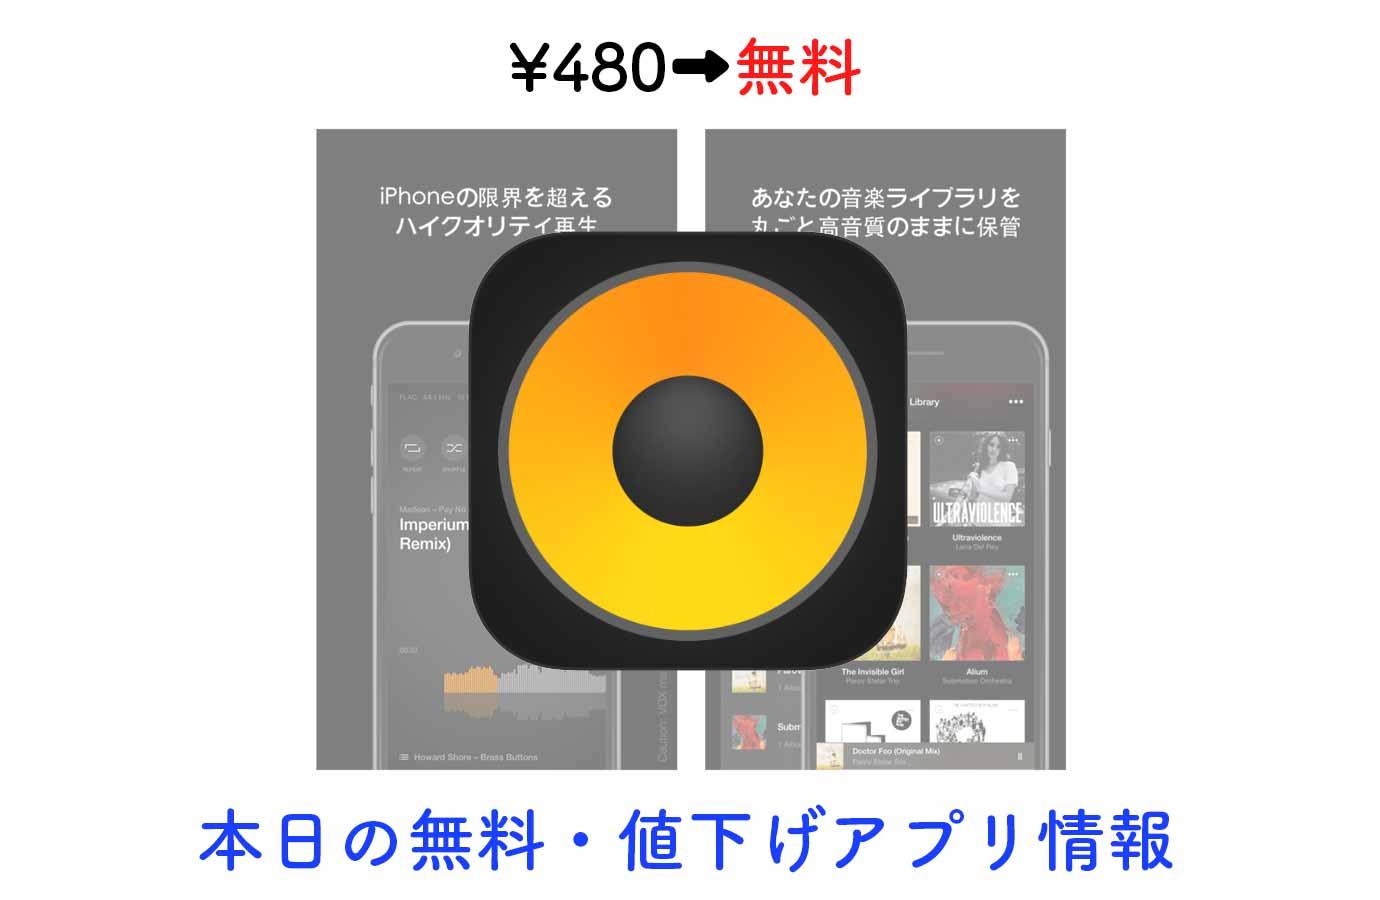 Appsale0719